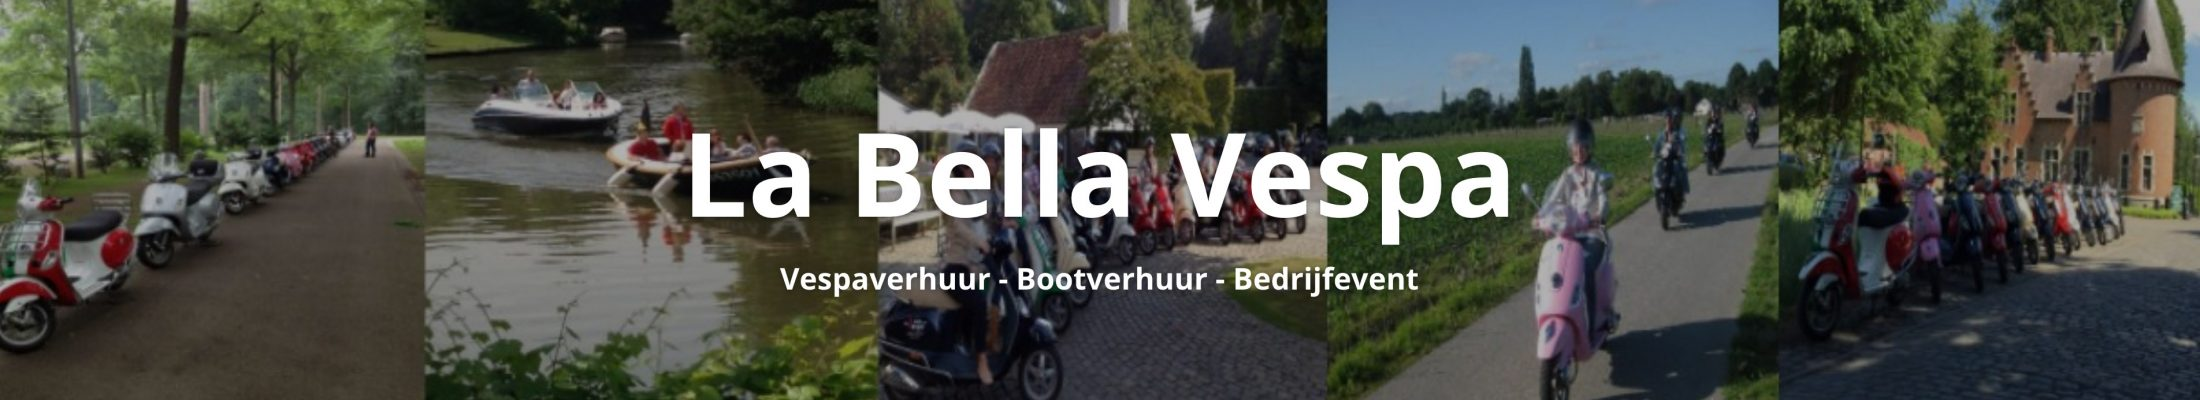 La Bella Vespa